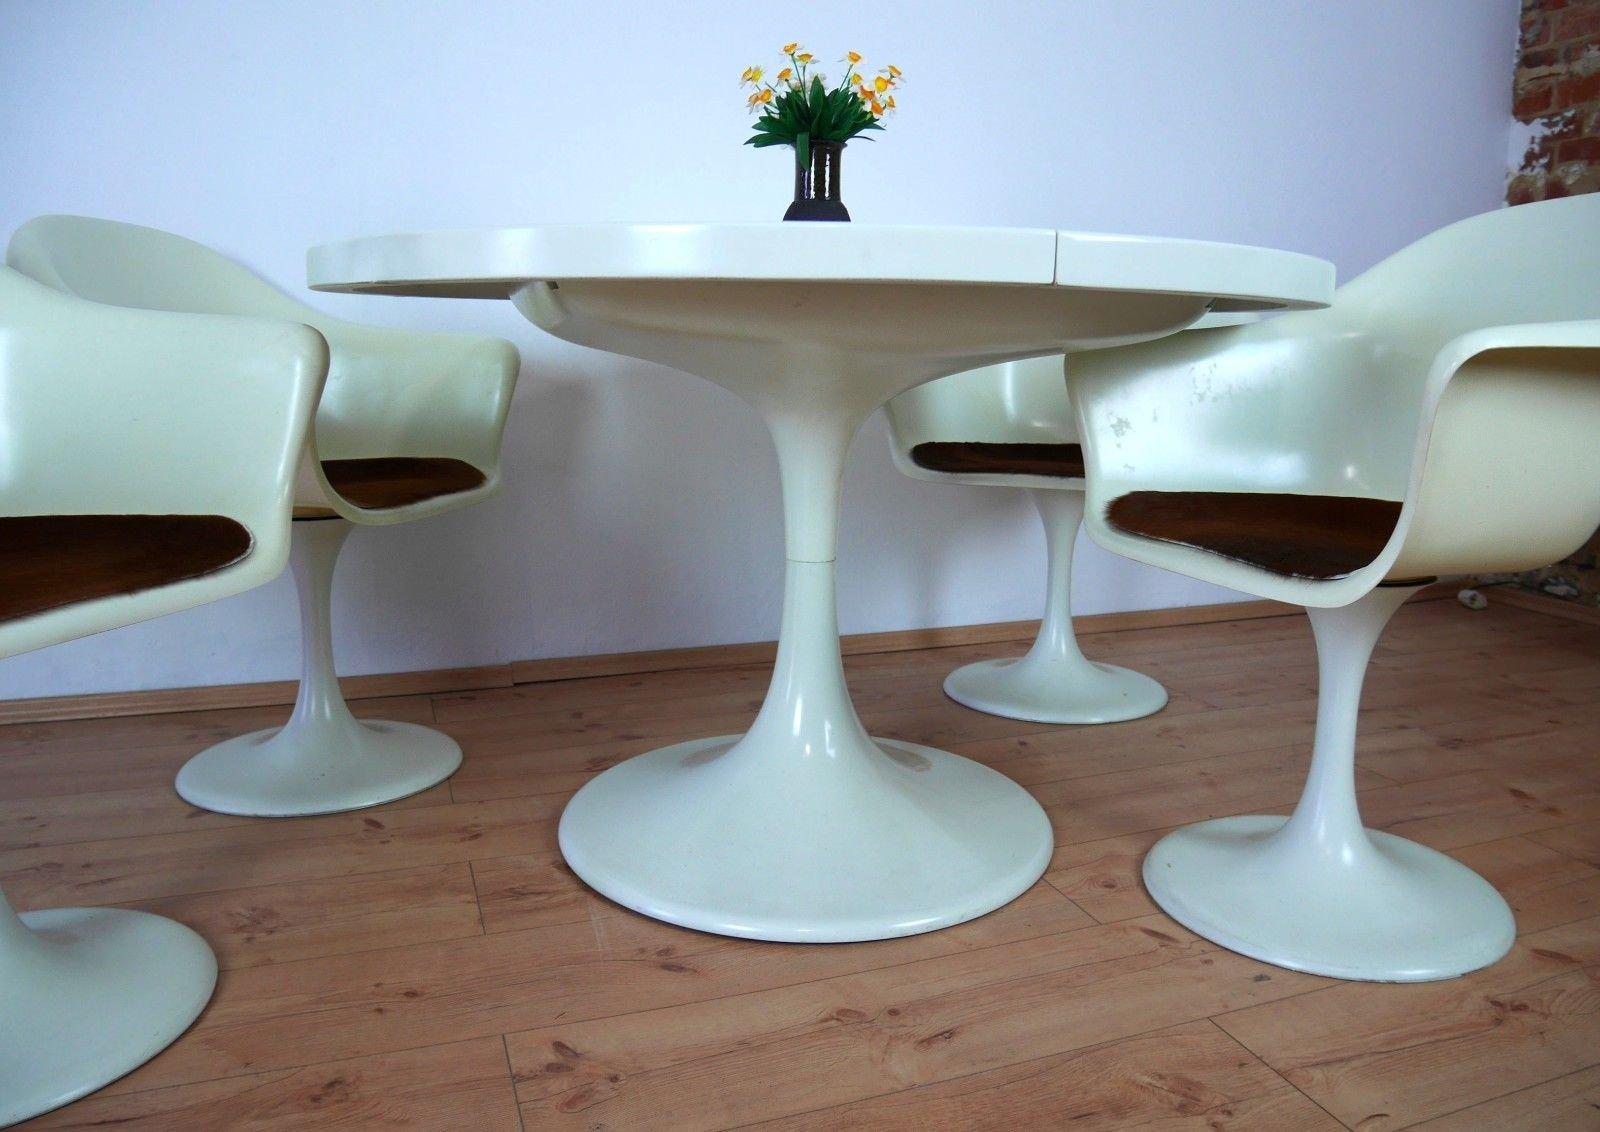 modell set line tulip tisch 4 st hle von konrad sch fer. Black Bedroom Furniture Sets. Home Design Ideas